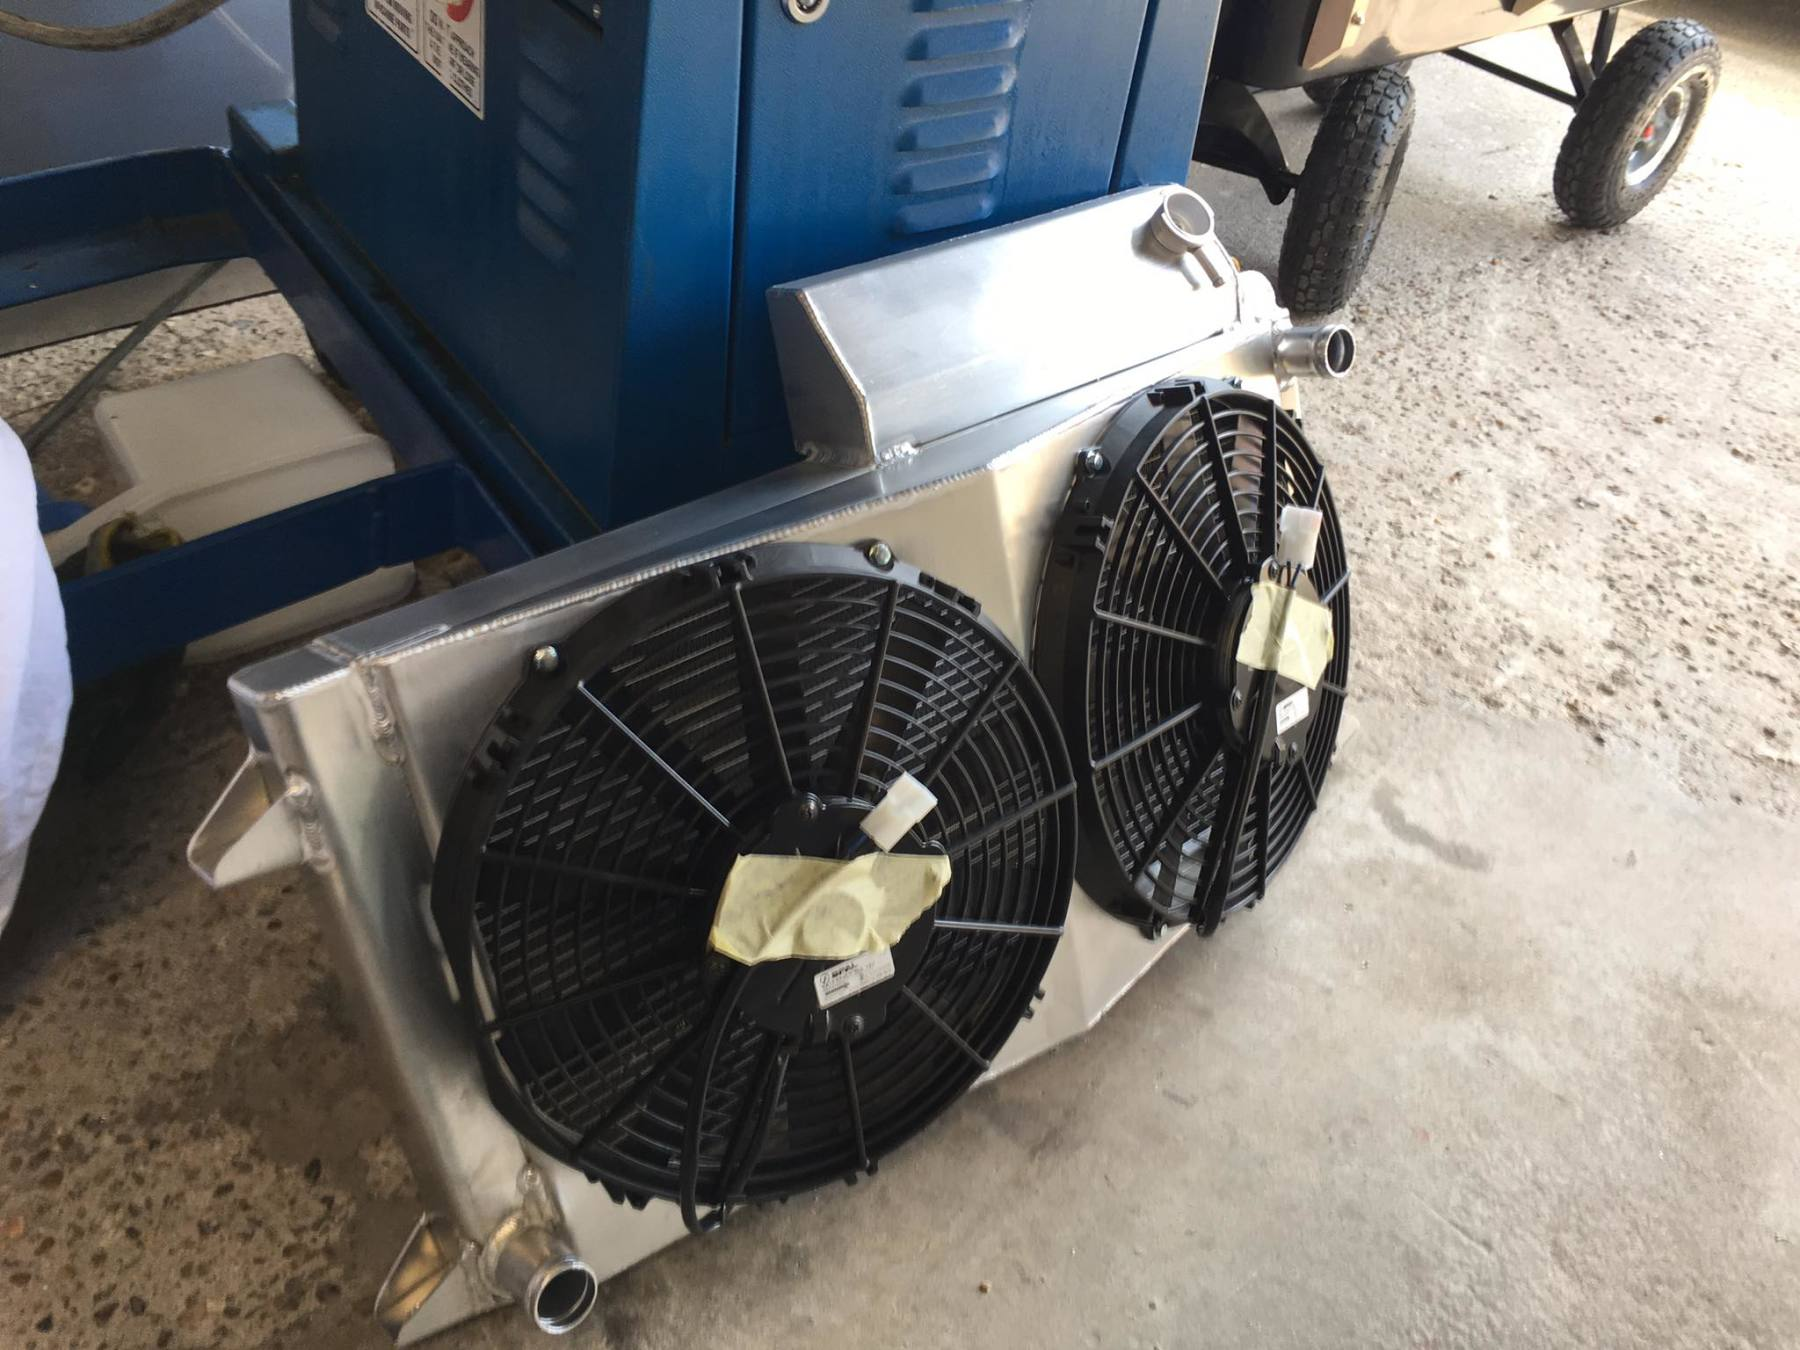 Class 7 autograss water radiator and integal header tank